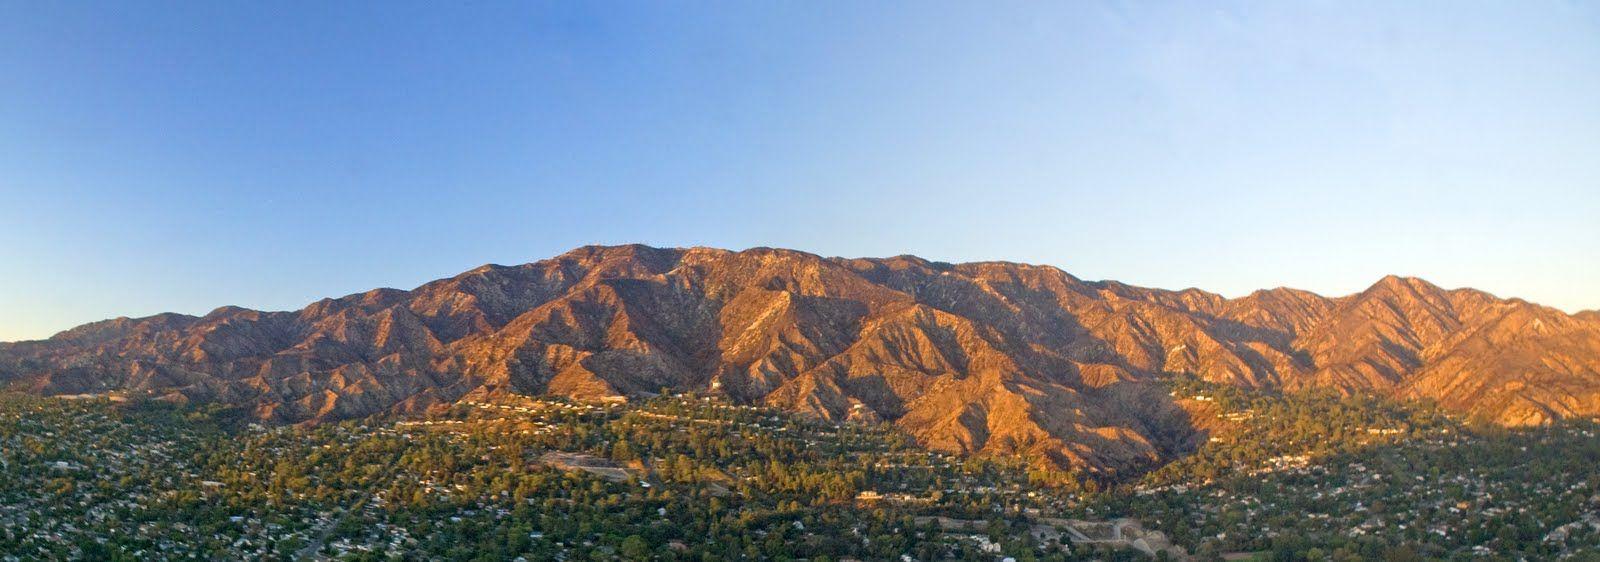 La Crescenta, California | Favorite Places & Spaces ...